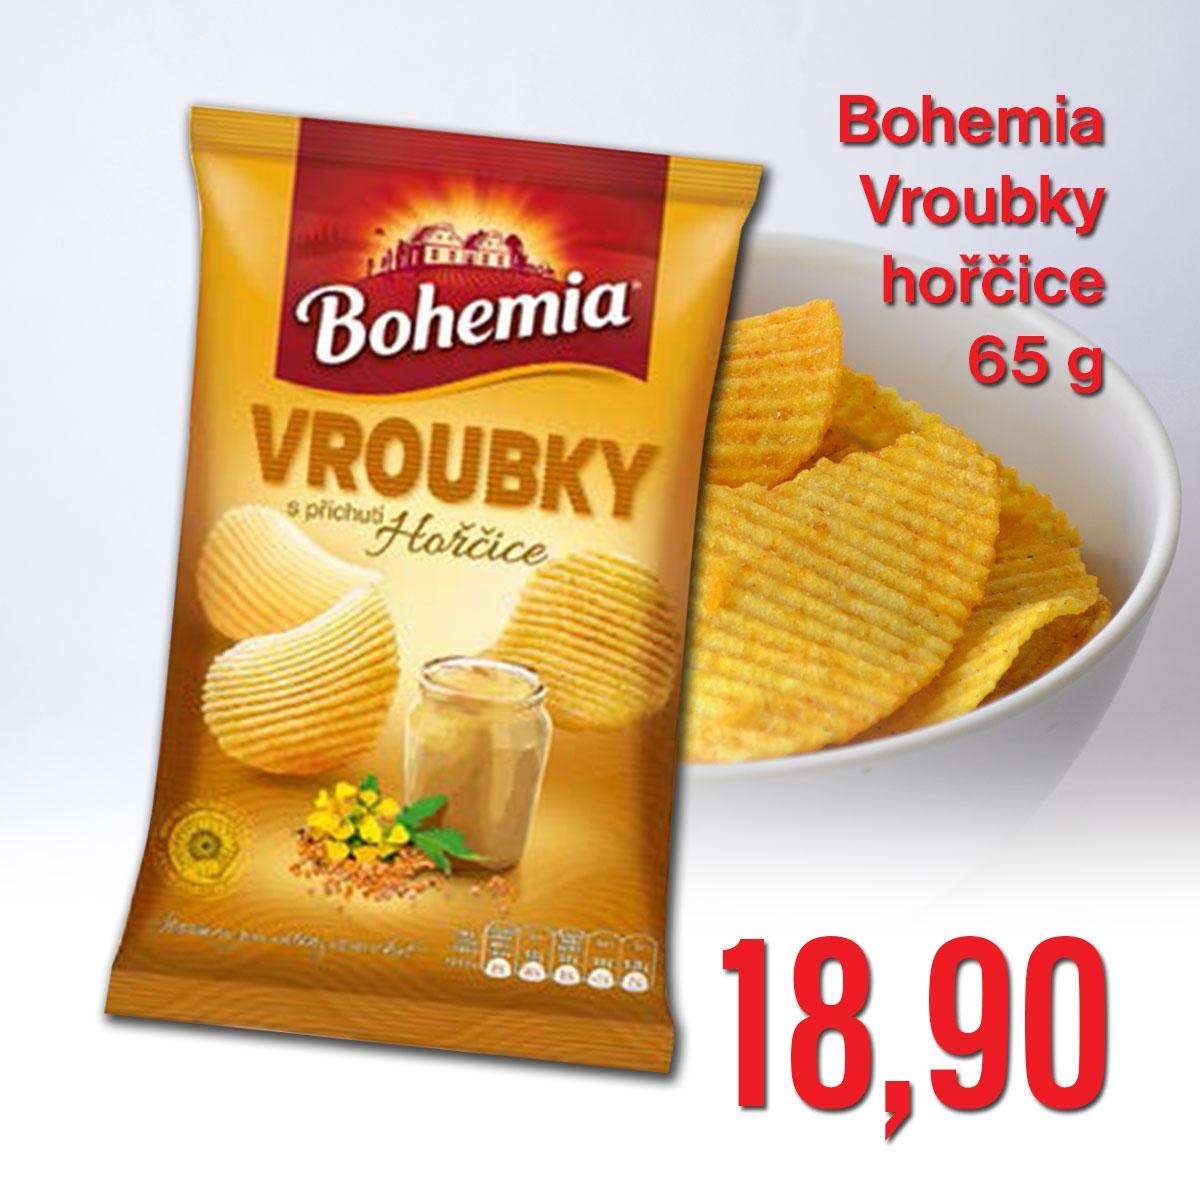 Bohemia Vroubky hořčice 65 g